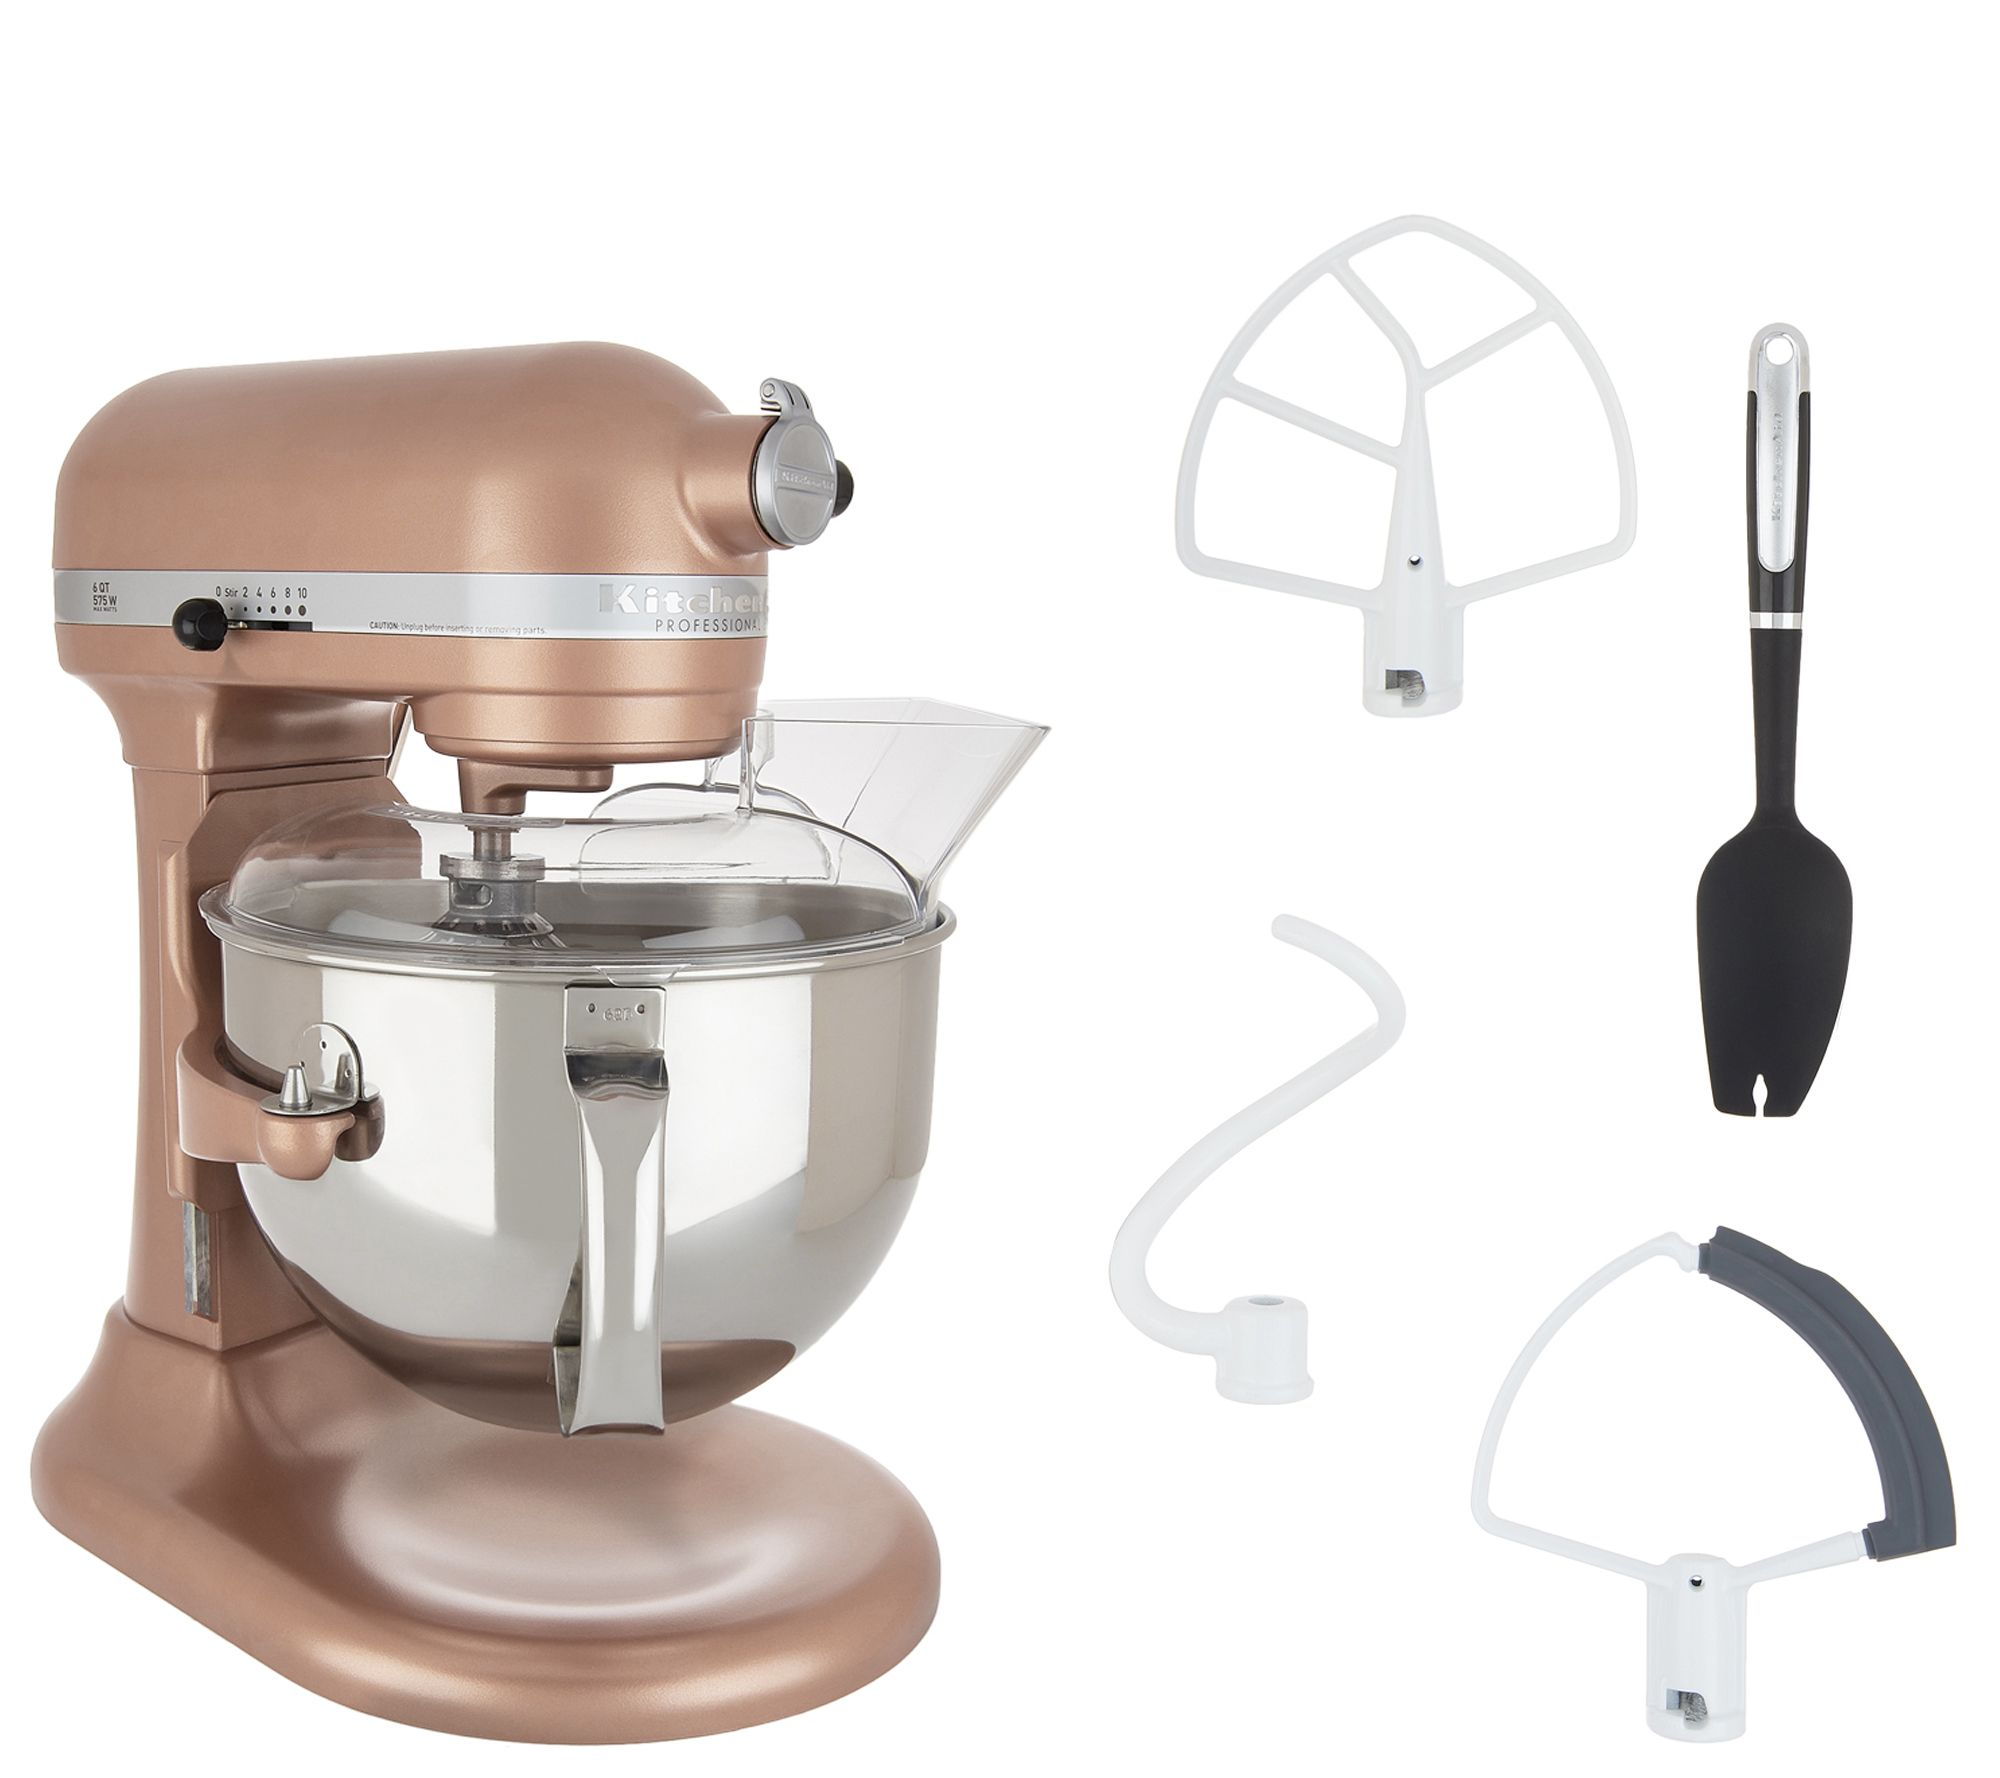 KitchenAid Pro 600 6-qt Bowl Lift Stand Mixer w/ Flex Edge Beater — QVC com